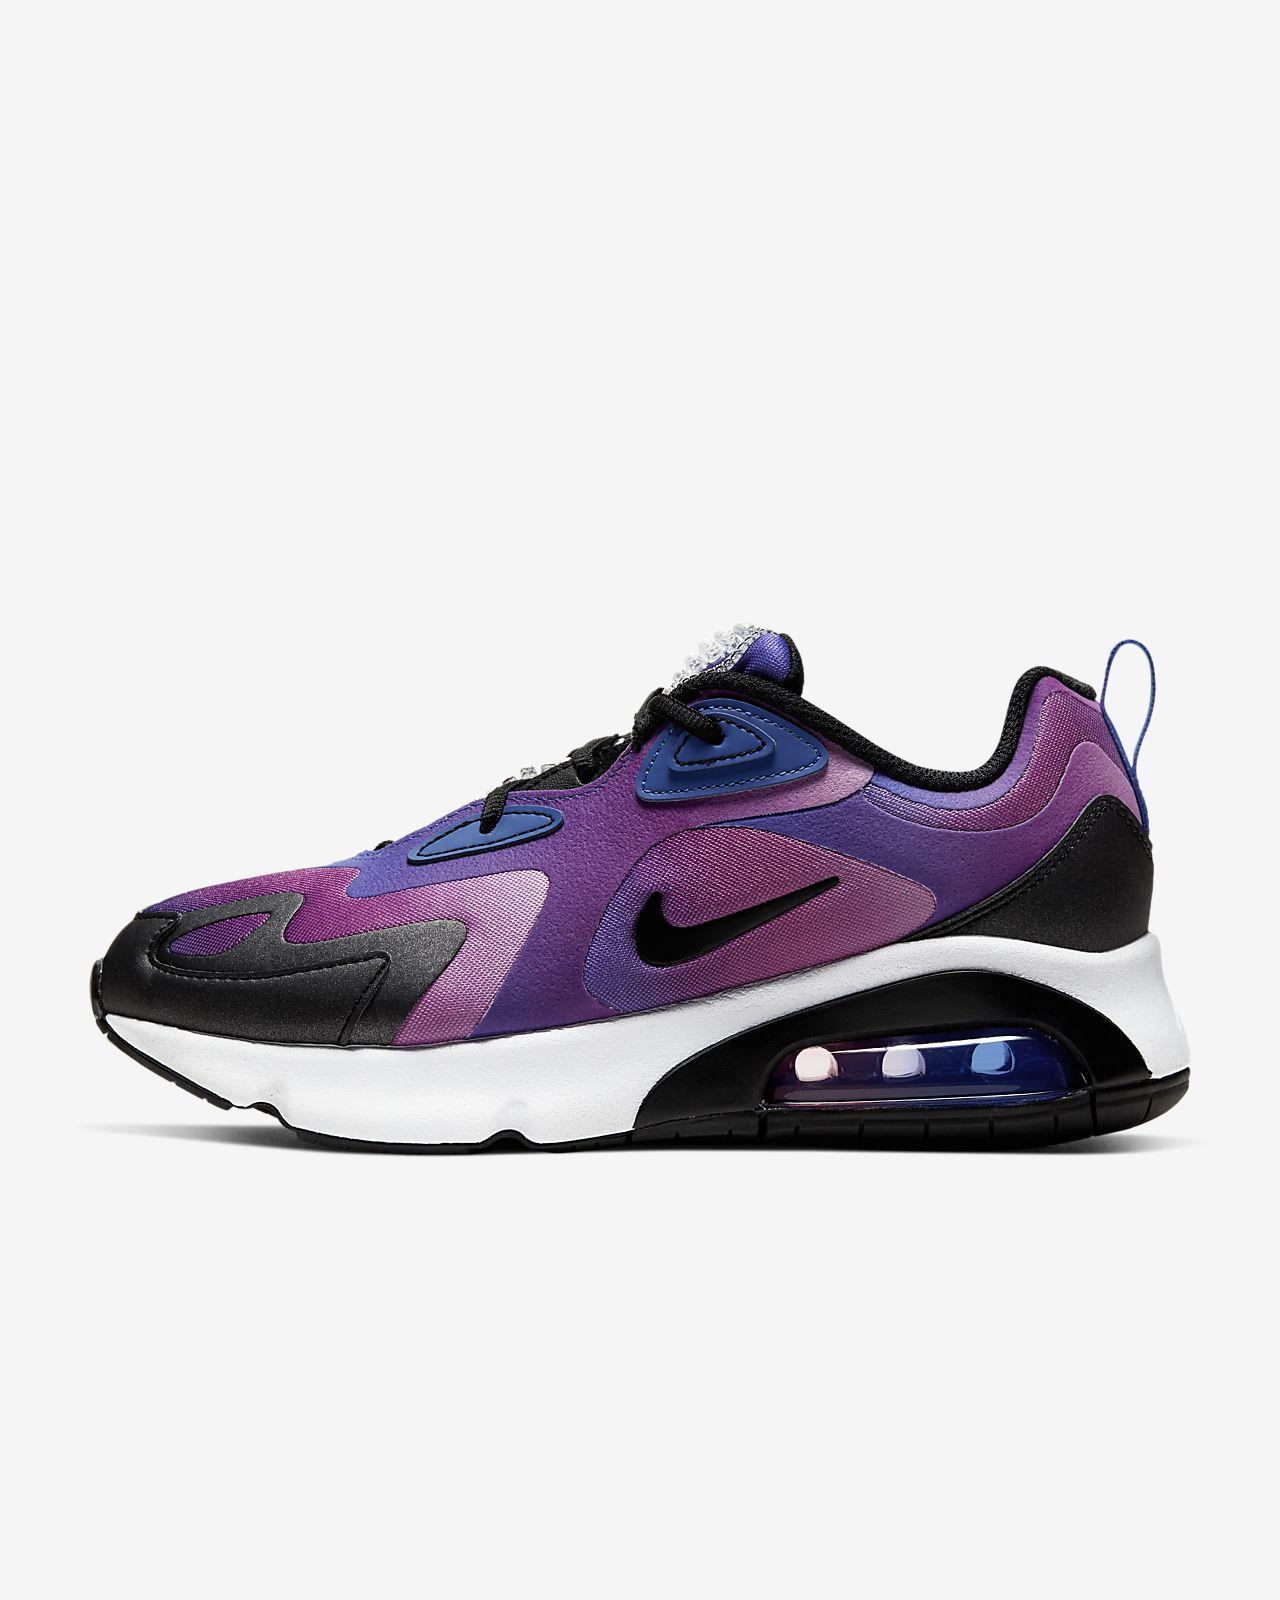 Chaussure Nike Air Max 200 SE pour Femme